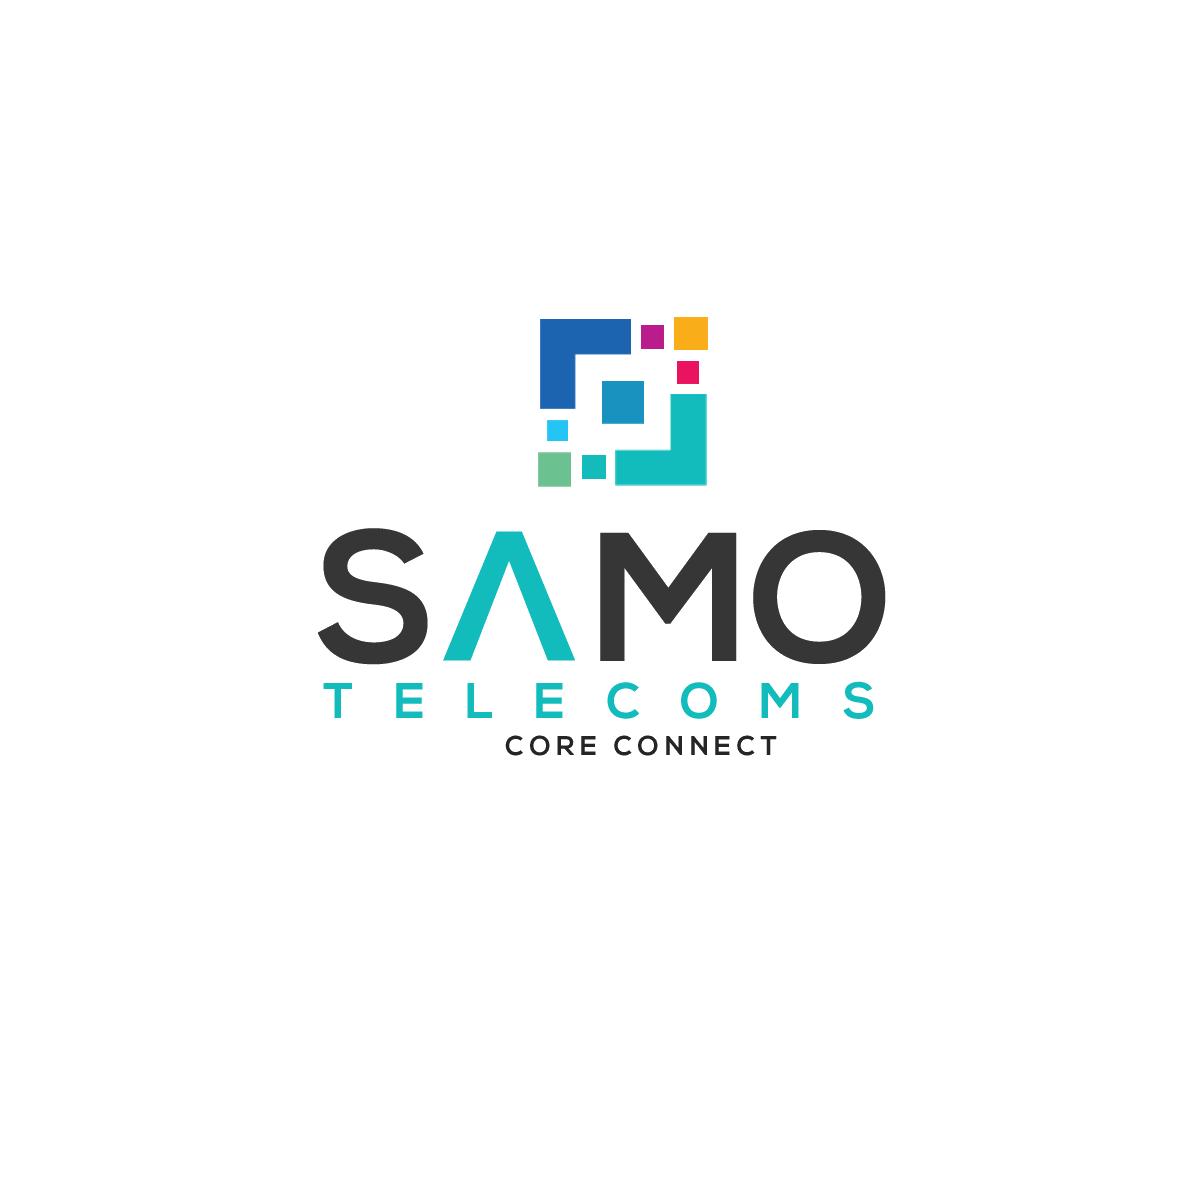 SAMO TELECOMS png